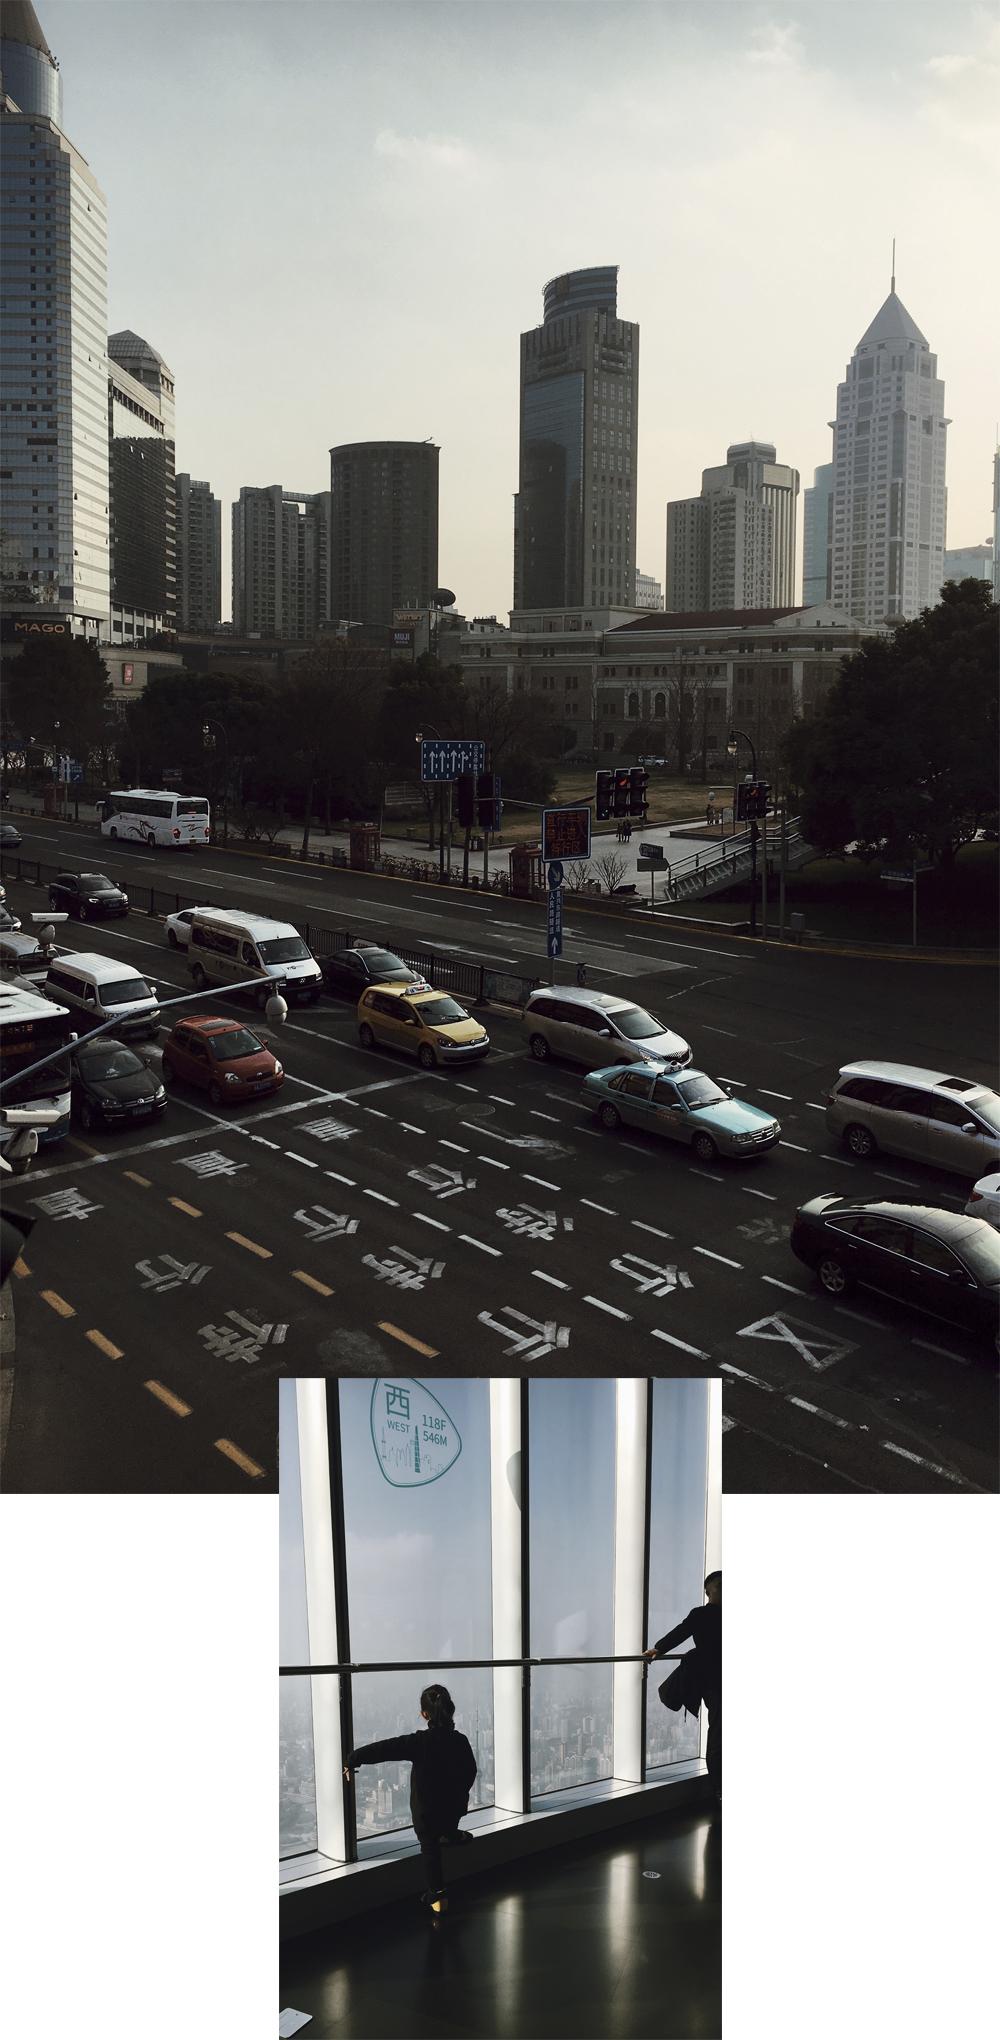 Shanghai_by_Amelie_Niederbuchner_3, Shanghai, Visual Diary, shot by Amelie Niederbuchner, photographer, Munich